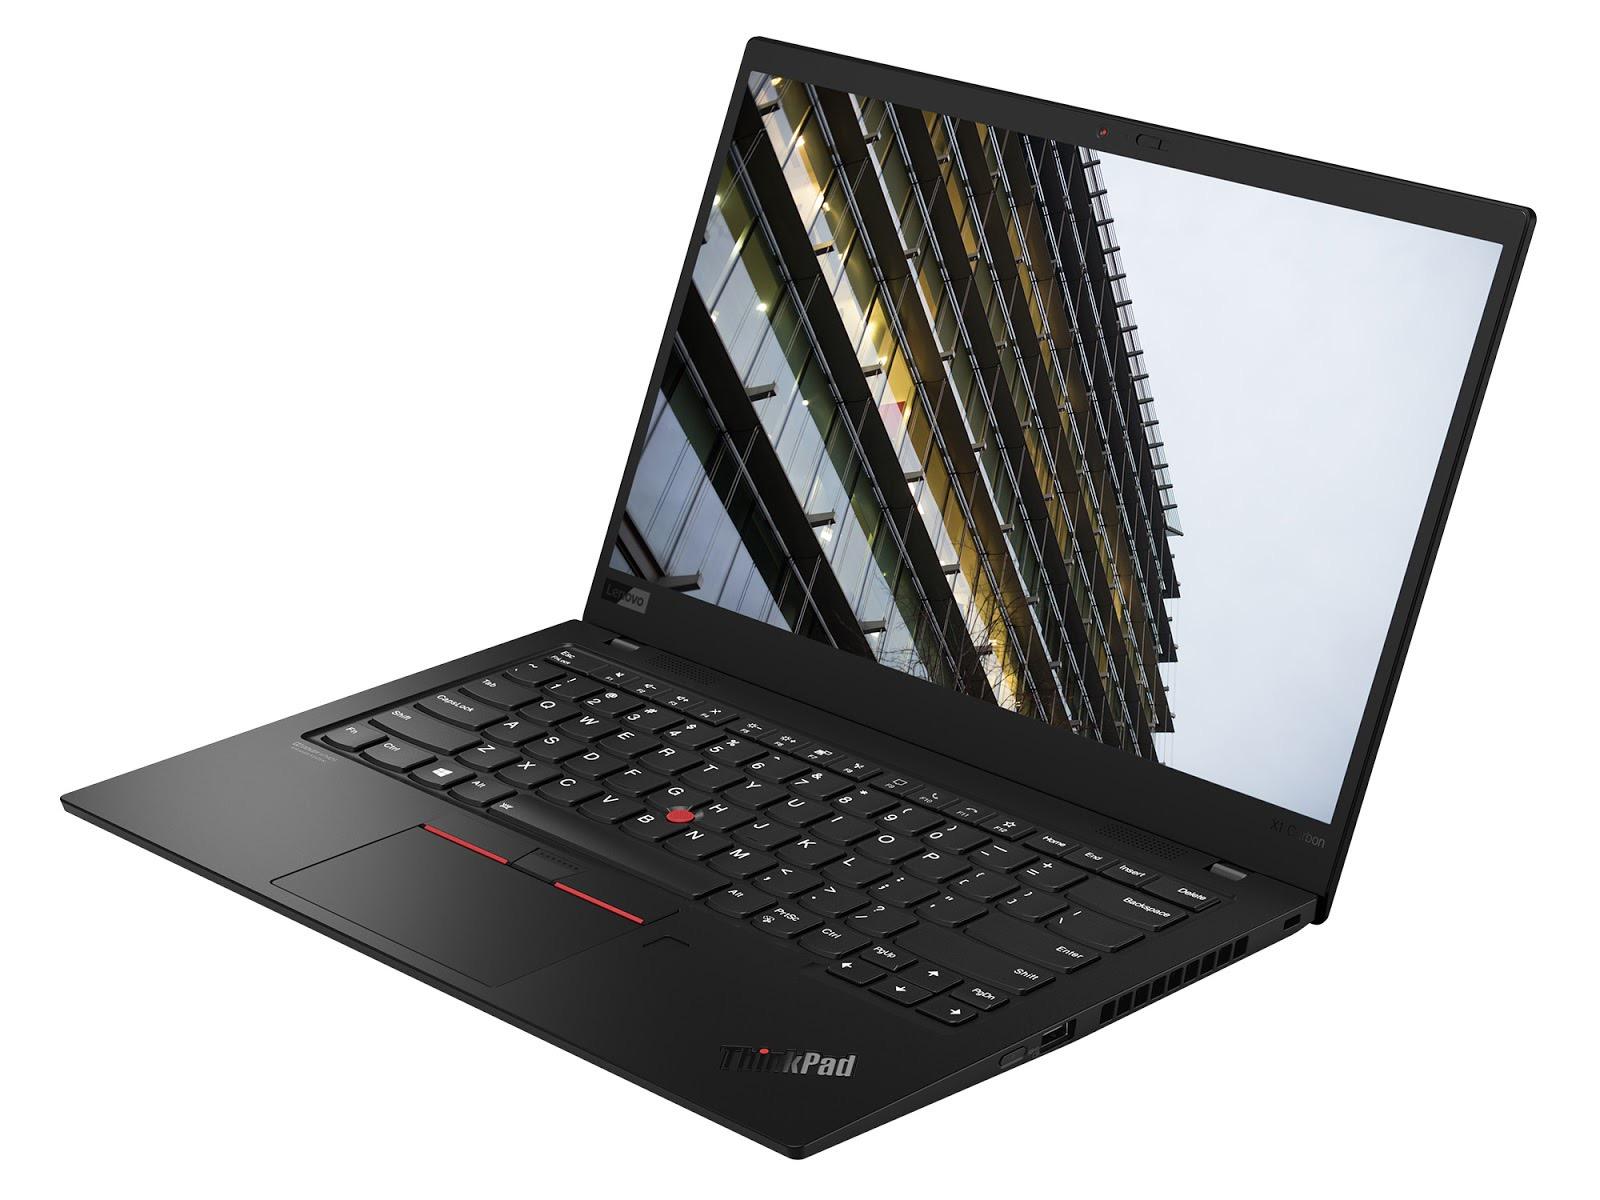 Фото 3. Ноутбук Lenovo ThinkPad X1 Carbon Gen 8 Black (20U9004PRT)